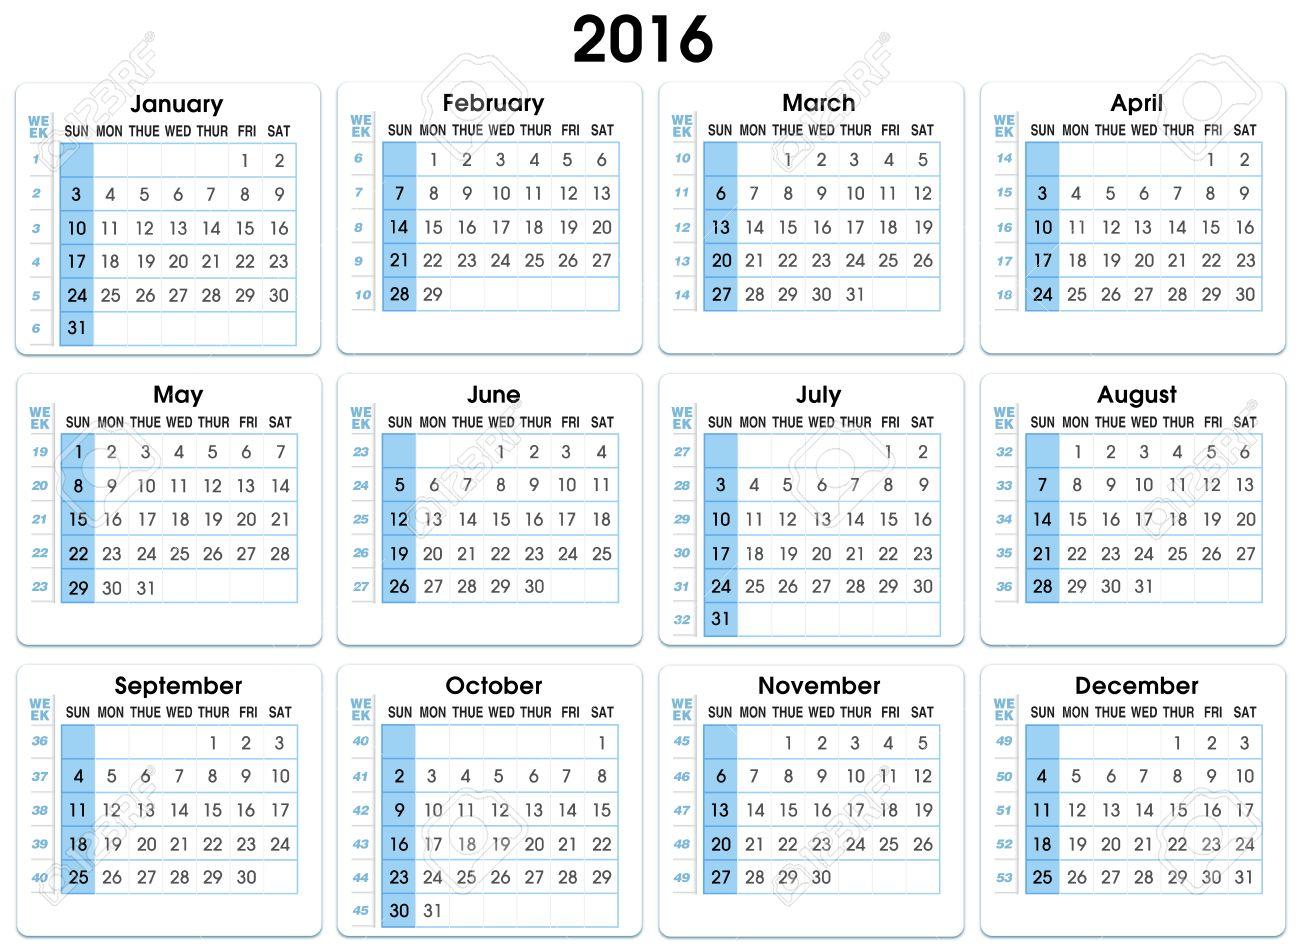 Calendrier Avec Numero Semaine.Calendrier 2016 12 Mois En Indiquant Le Numero Semaines 2016 Calendrier Avec Nombre Semaines